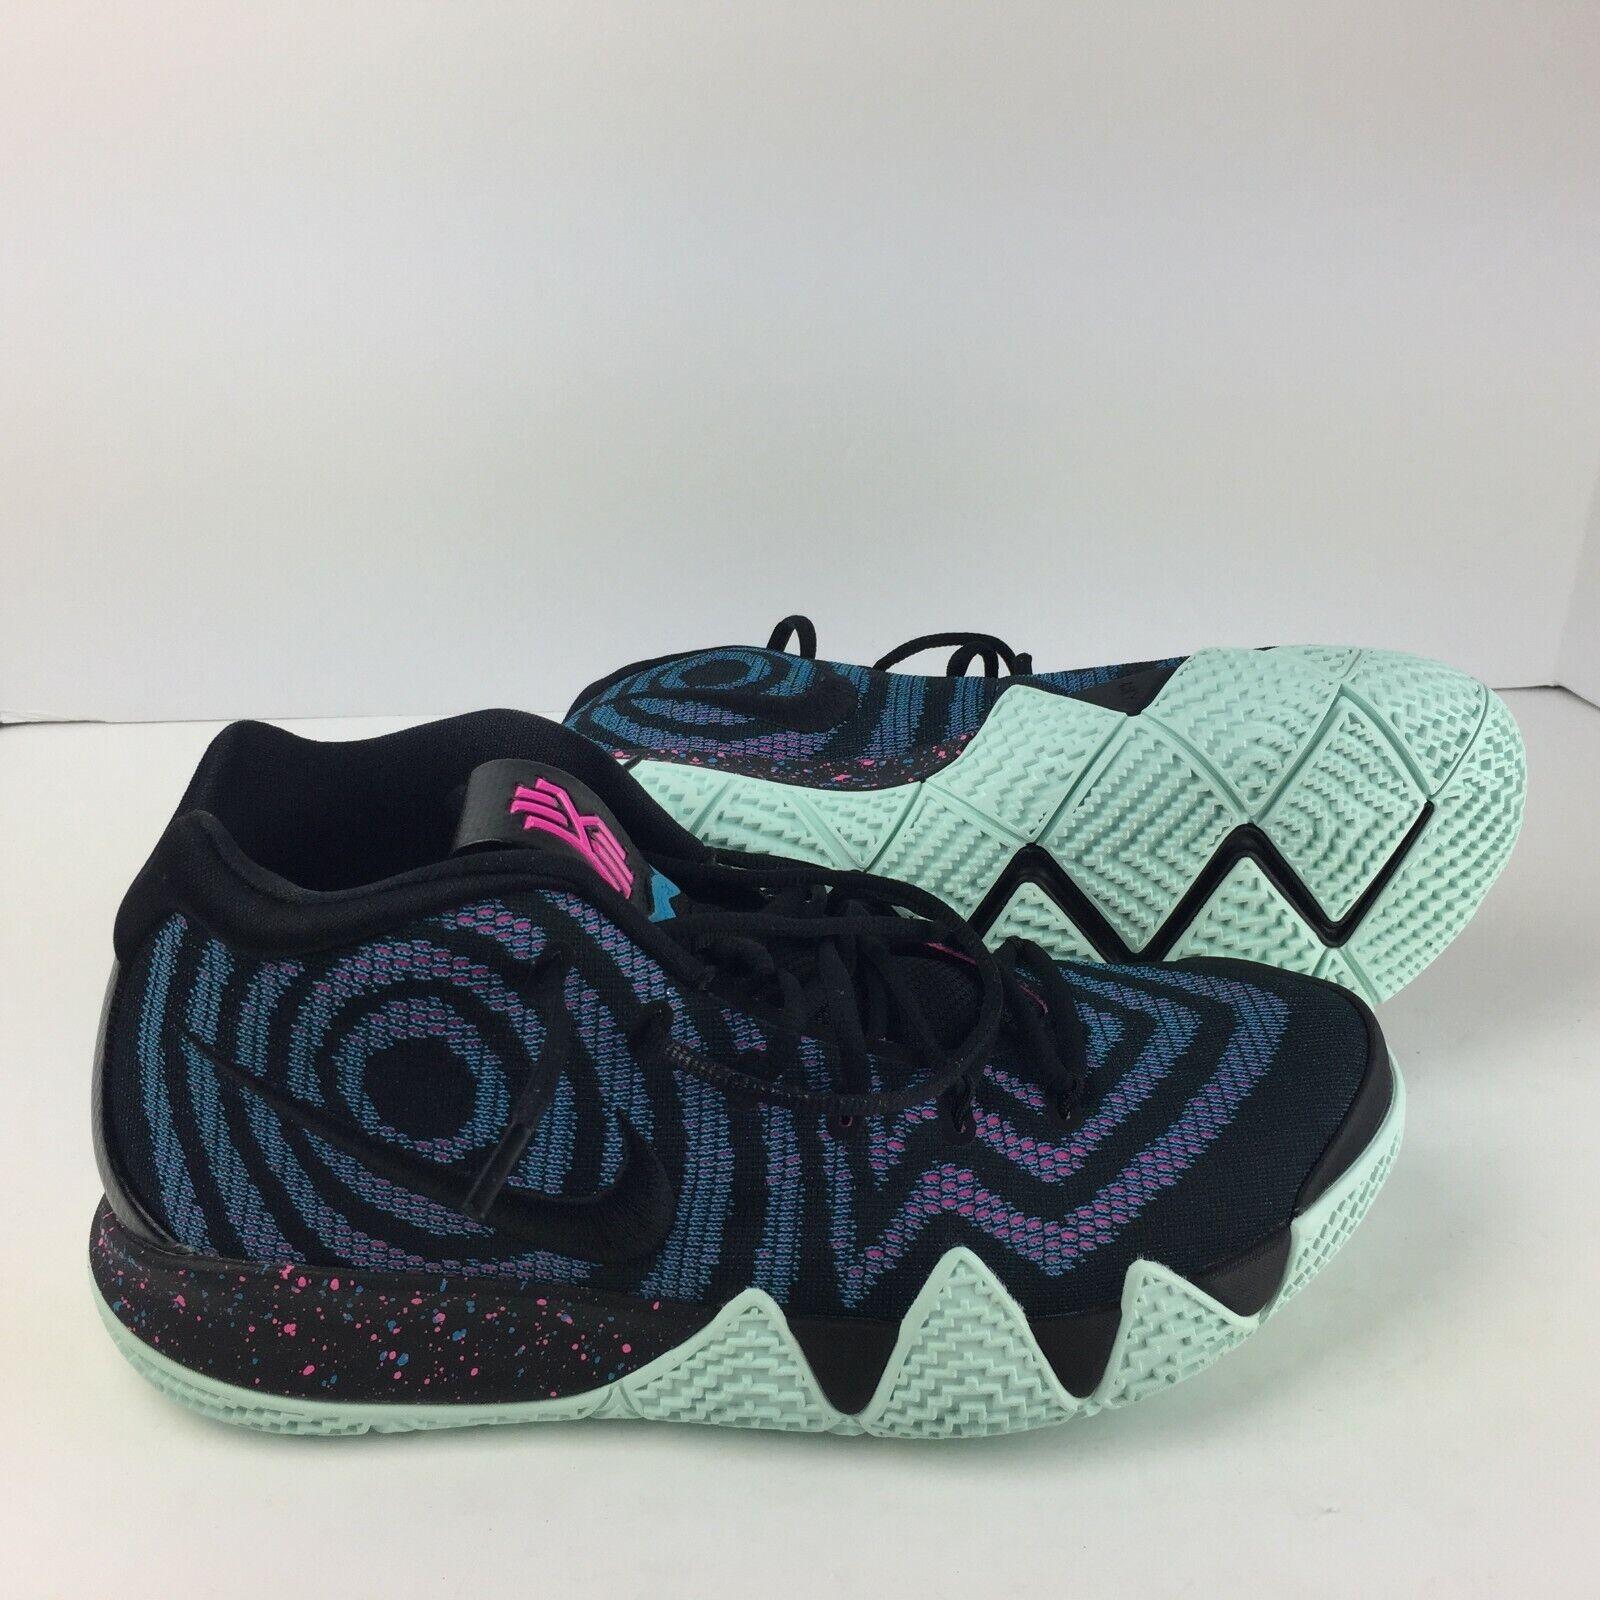 Nike Kyrie 4 Men's Basketball shoes 943806 007 Black-Black Laser Fuchsia